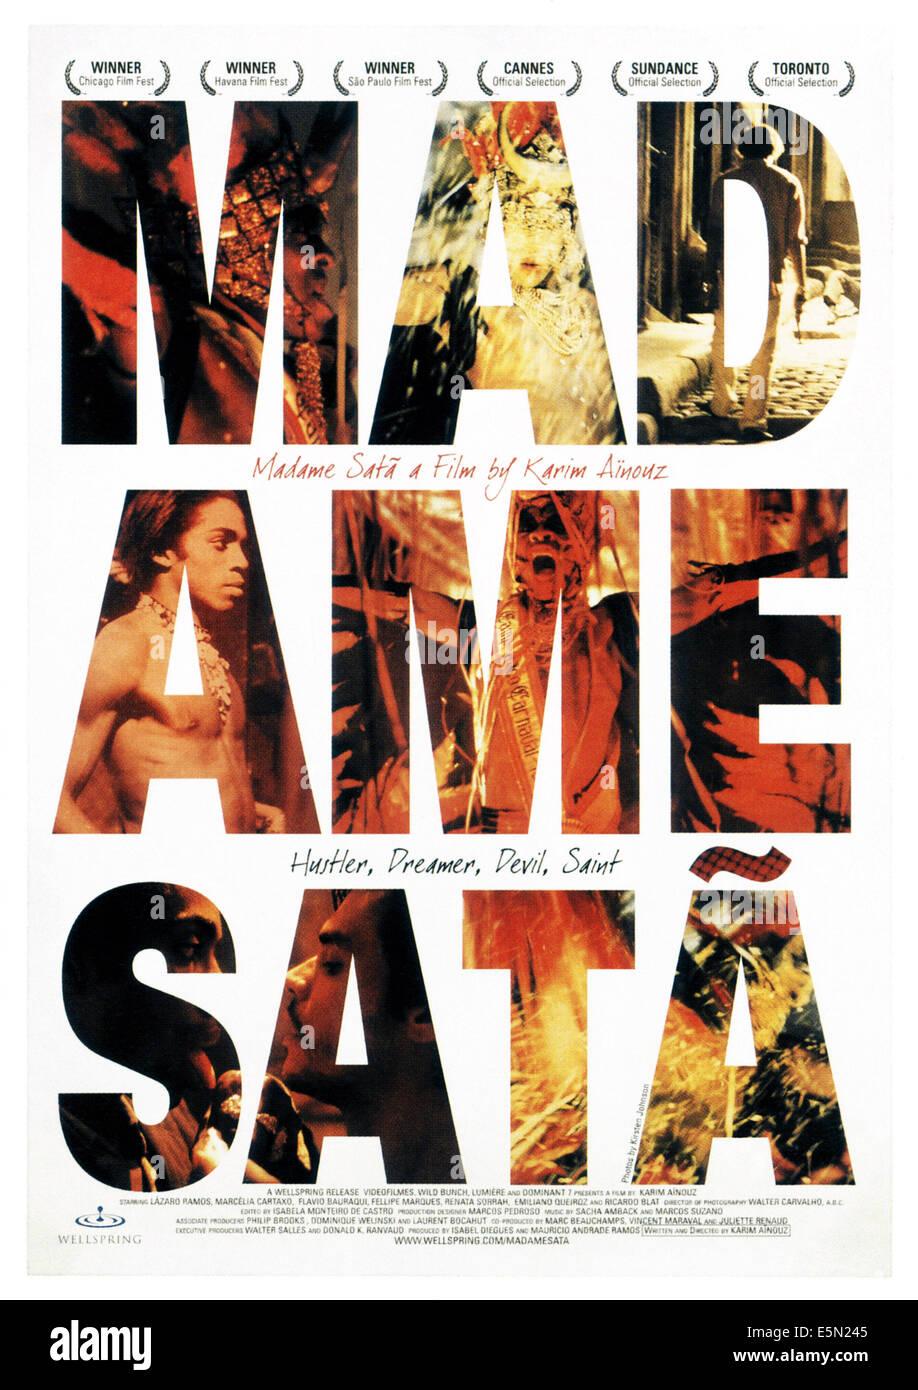 MADAME SATA, poster art, 2002, ©Wellspring Media/courtesy Everett Collection - Stock Image